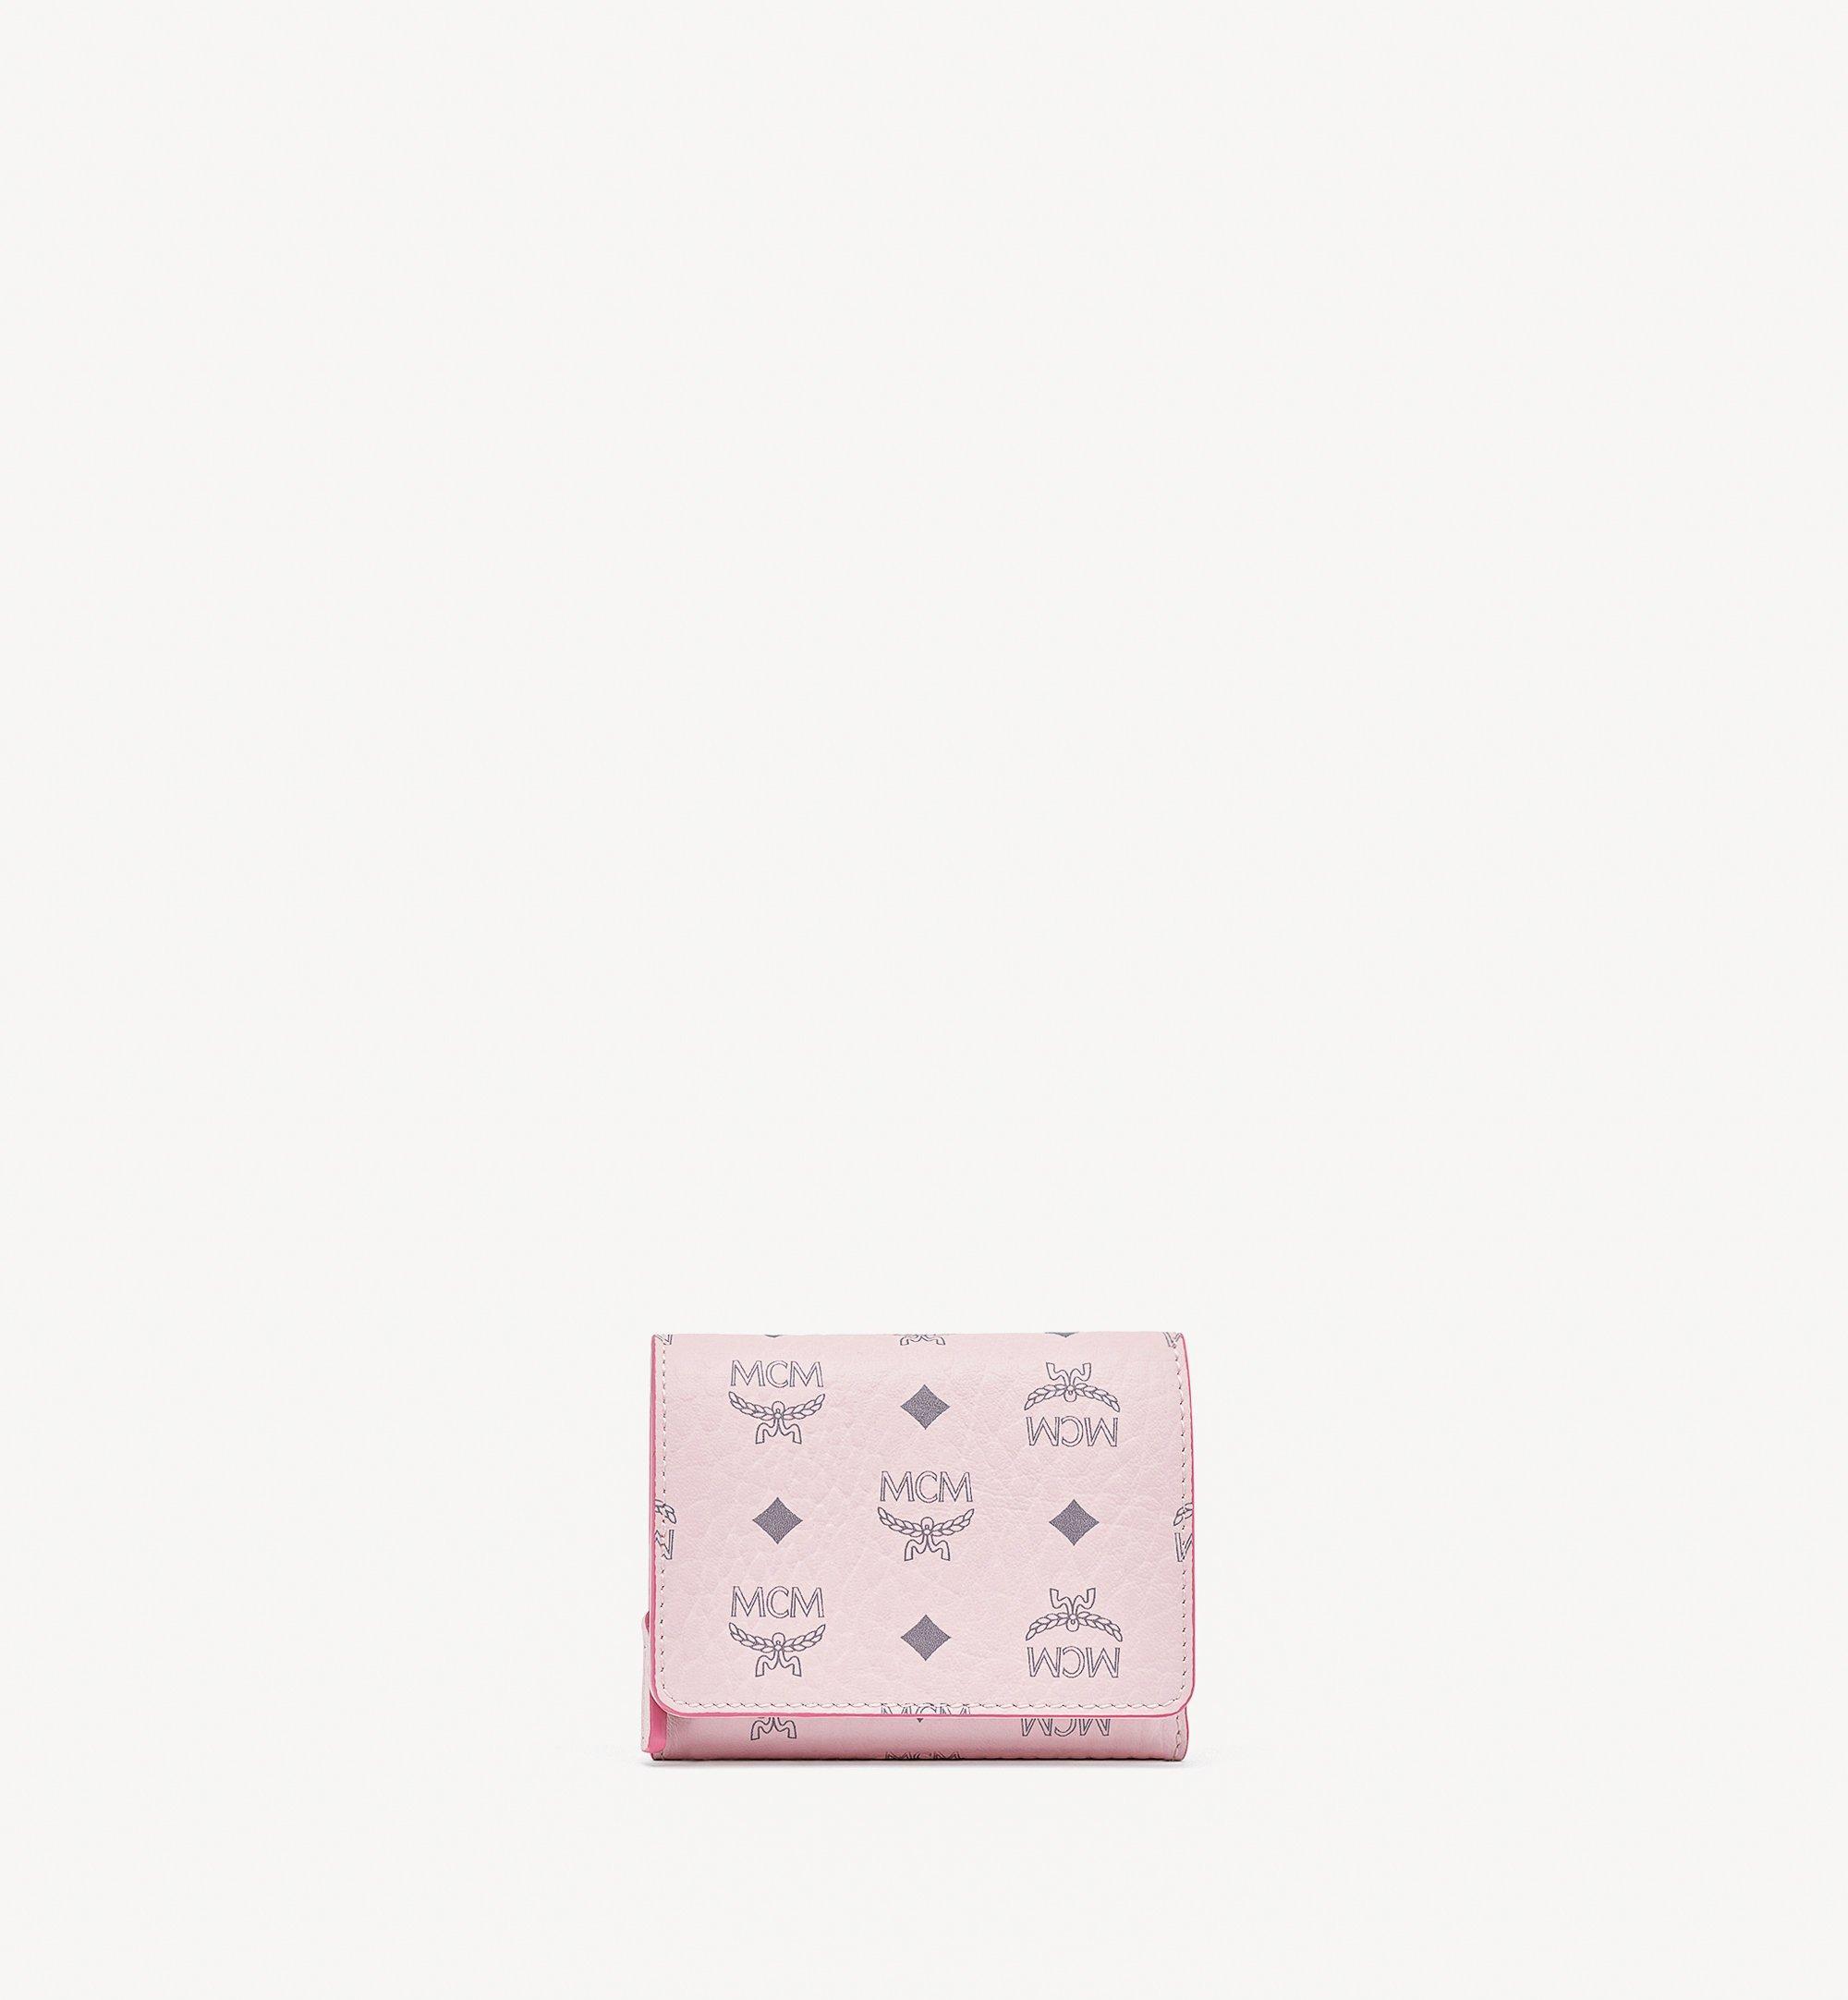 MCM Visetos Original 系列三折錢包 Pink MYSBSVI01QH001 更多視圖 1